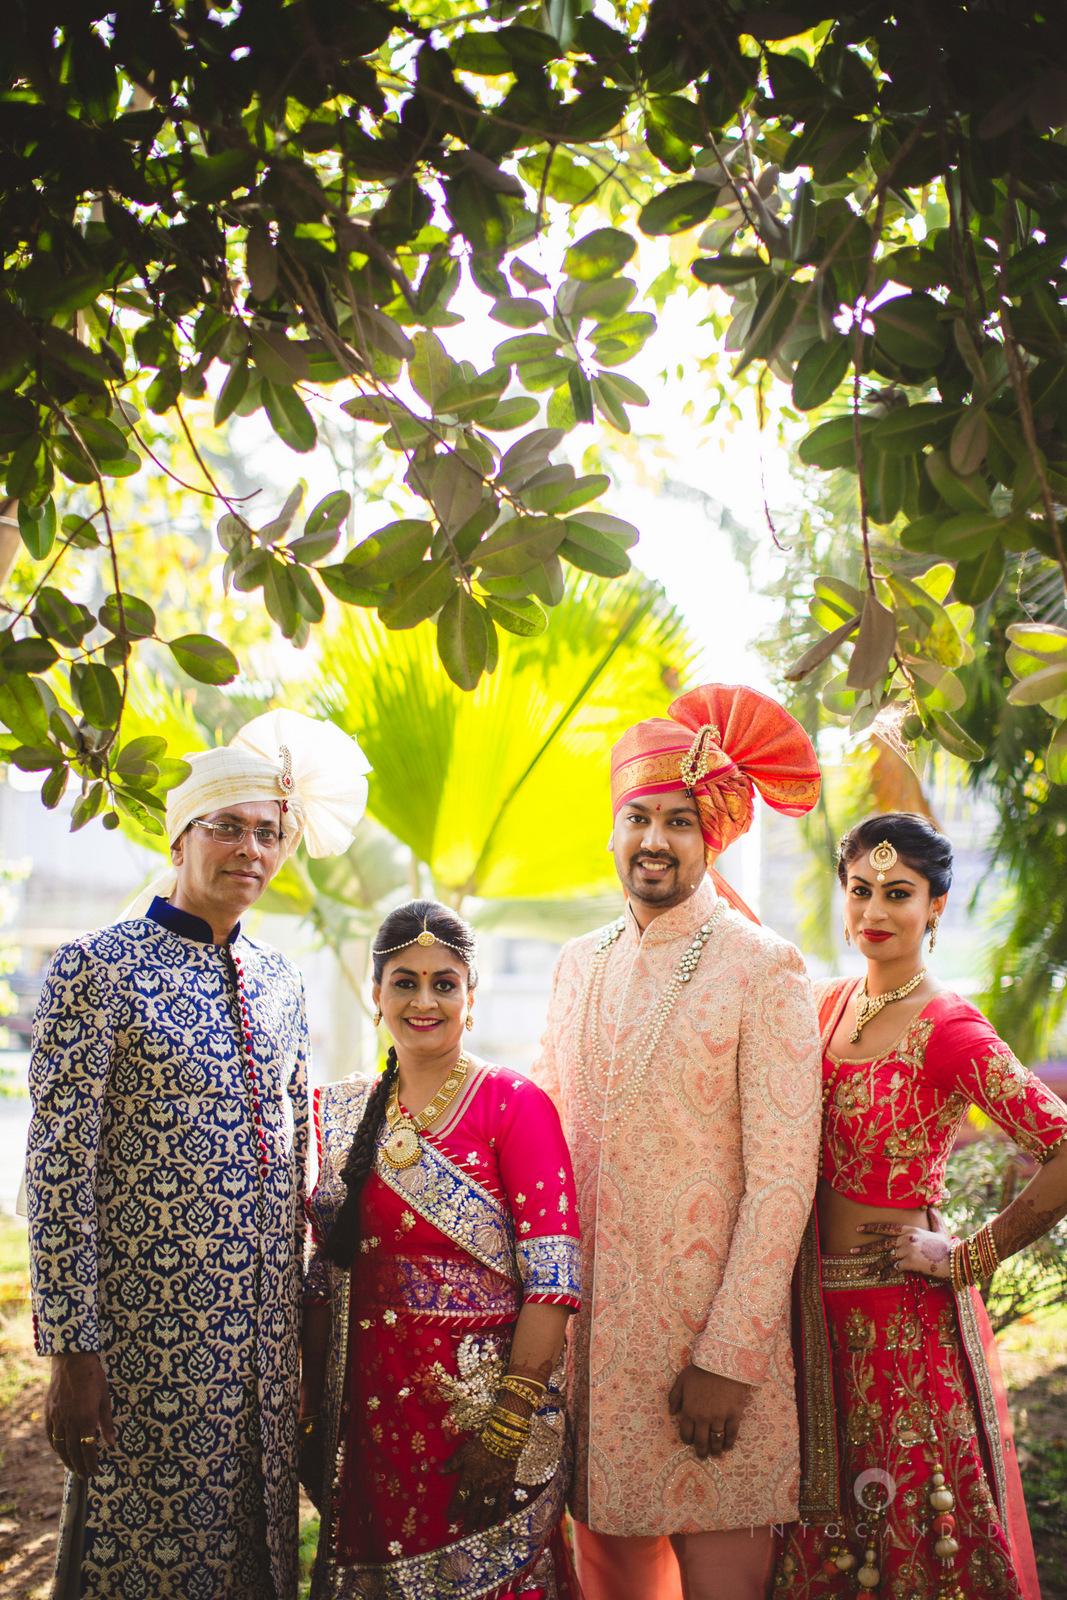 mumbai-gujarati-wedding-photographer-intocandid-photography-tg-029.jpg